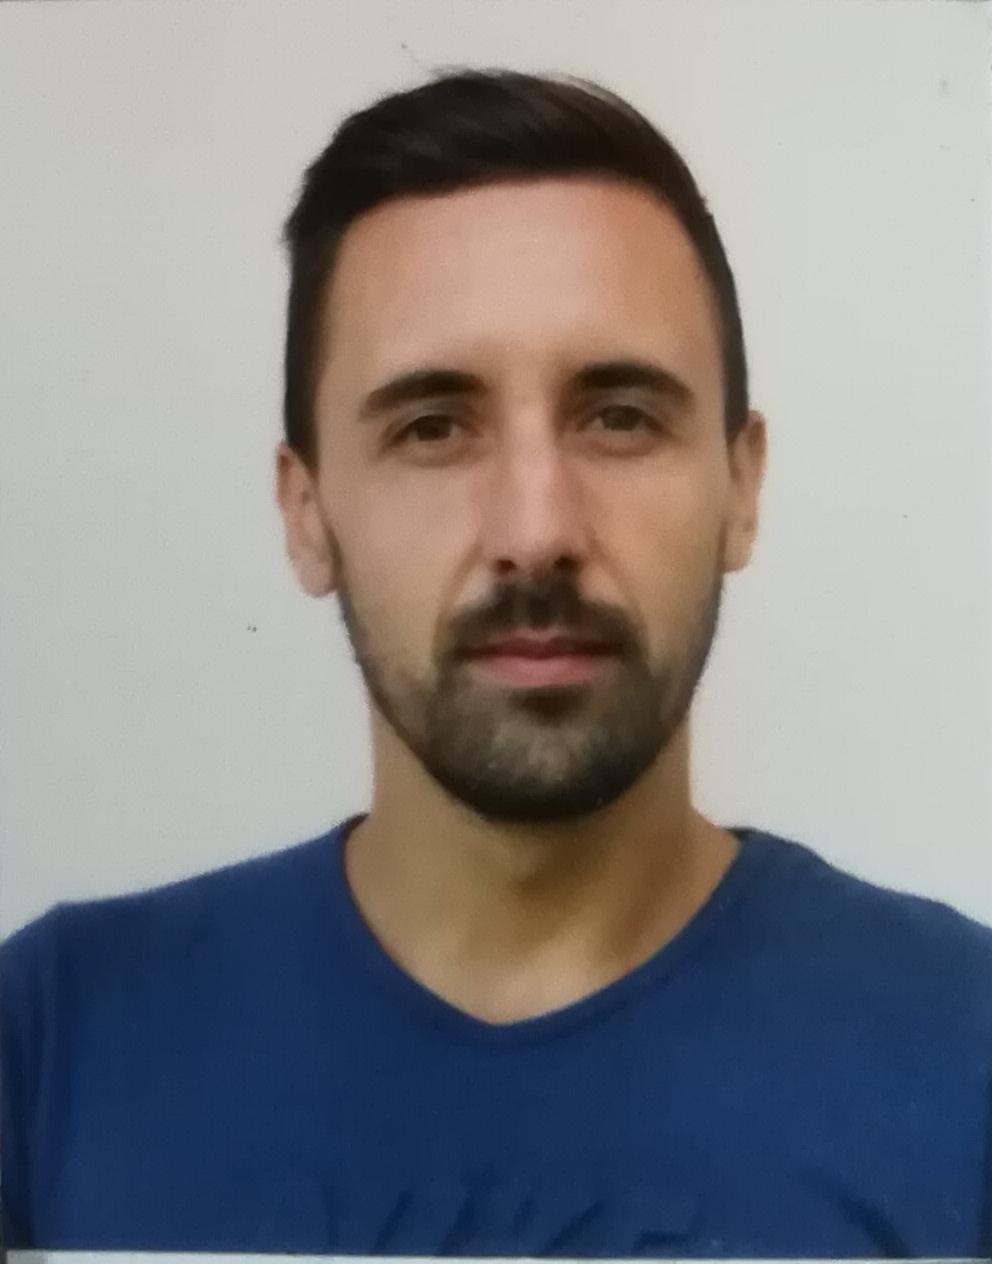 Postolache Ionut Eduard